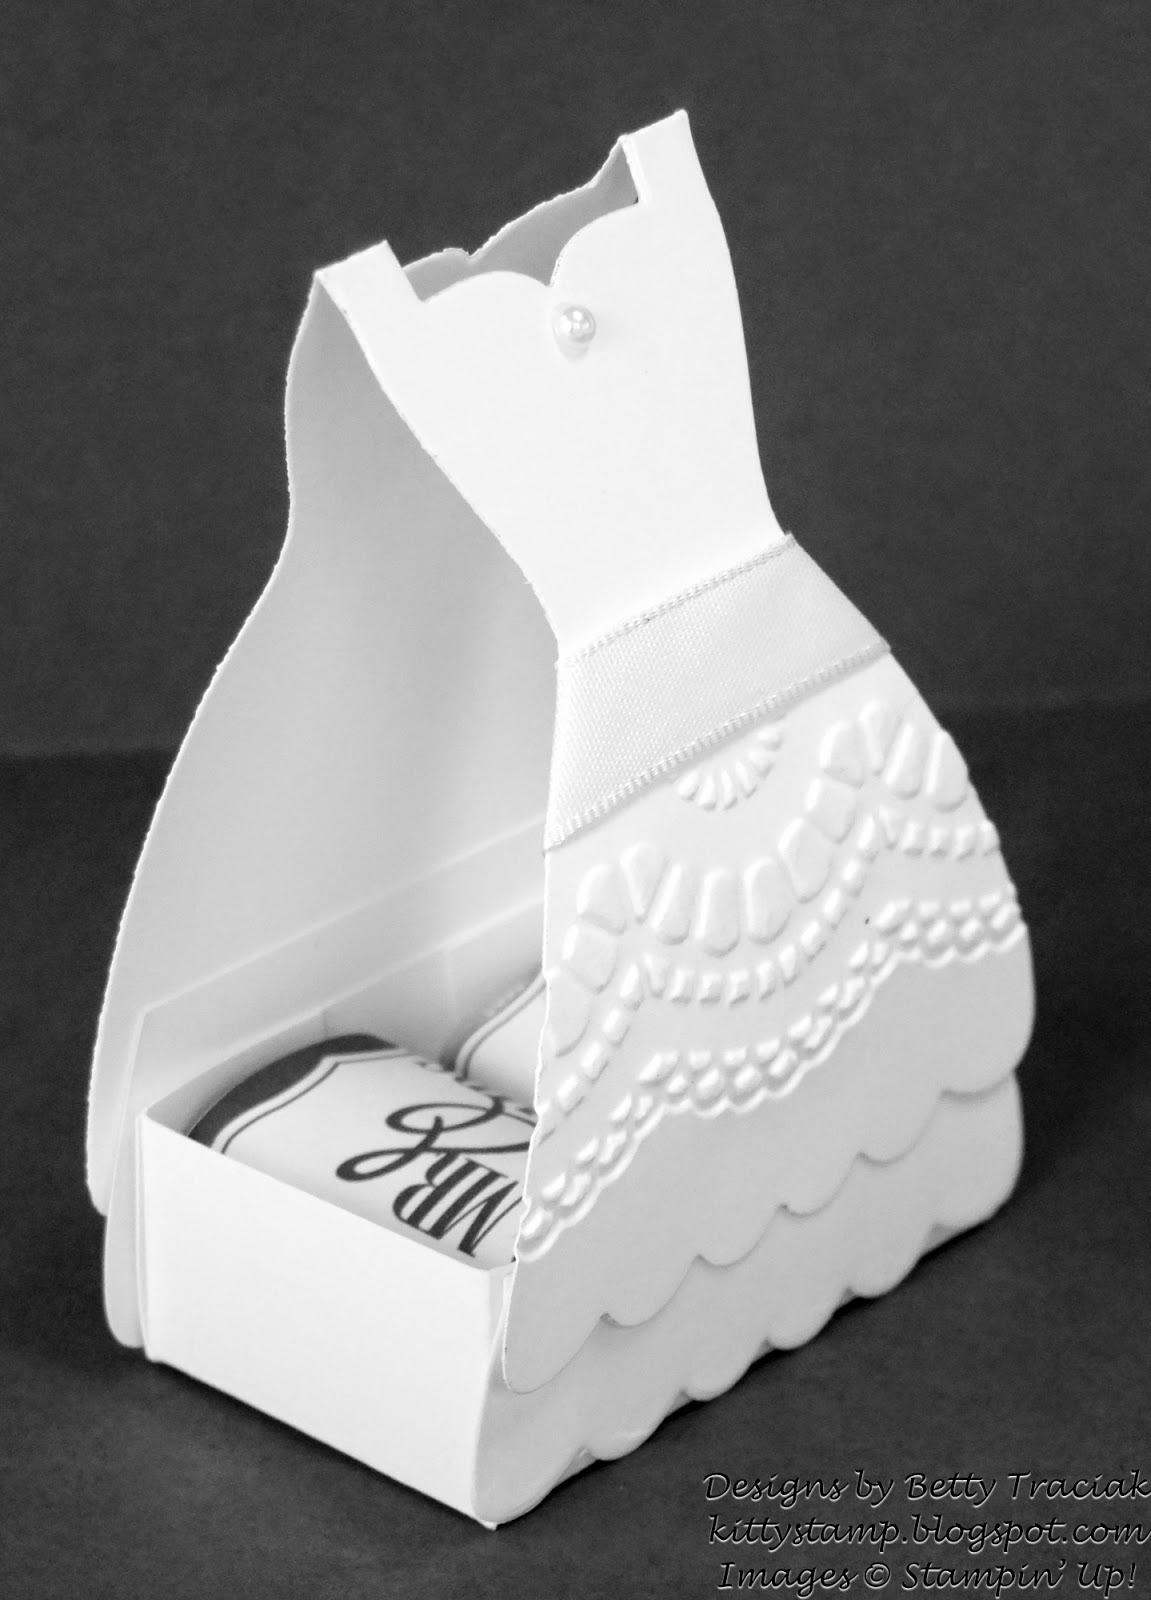 Kitty Stamp: Dress Up Bridal Shower Favors